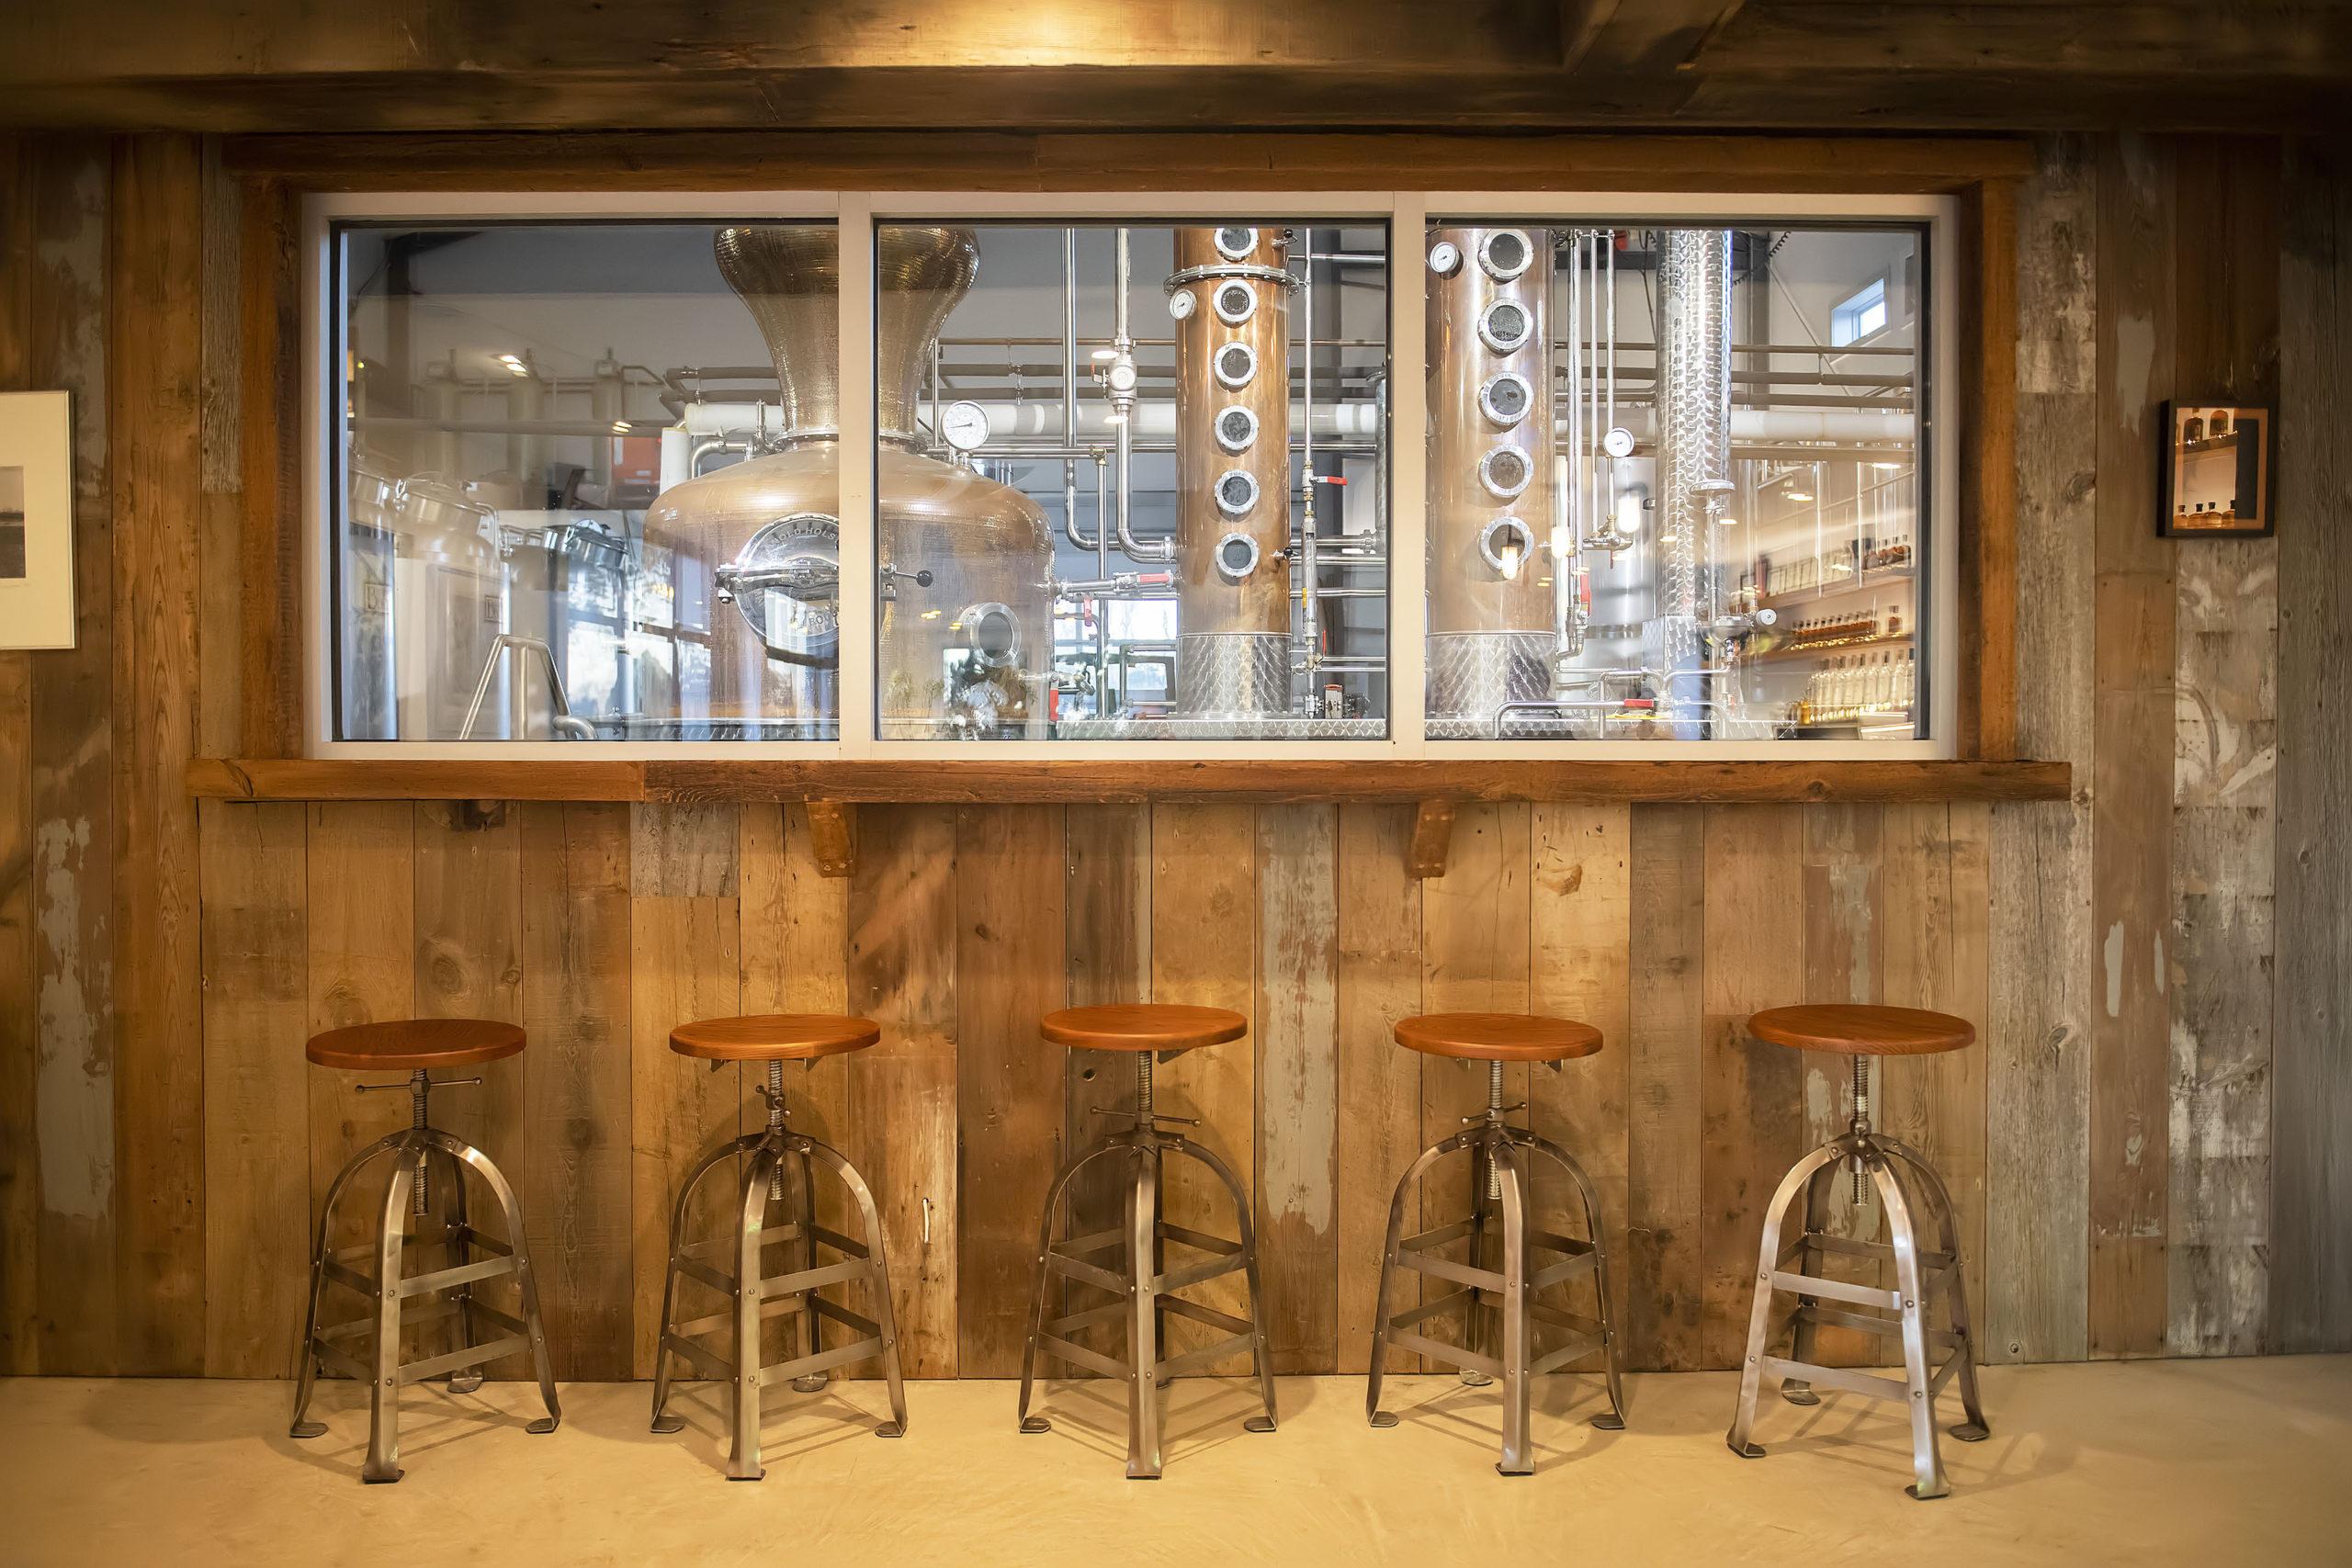 Visitors can view distilling equipment. MICHAEL HELLER